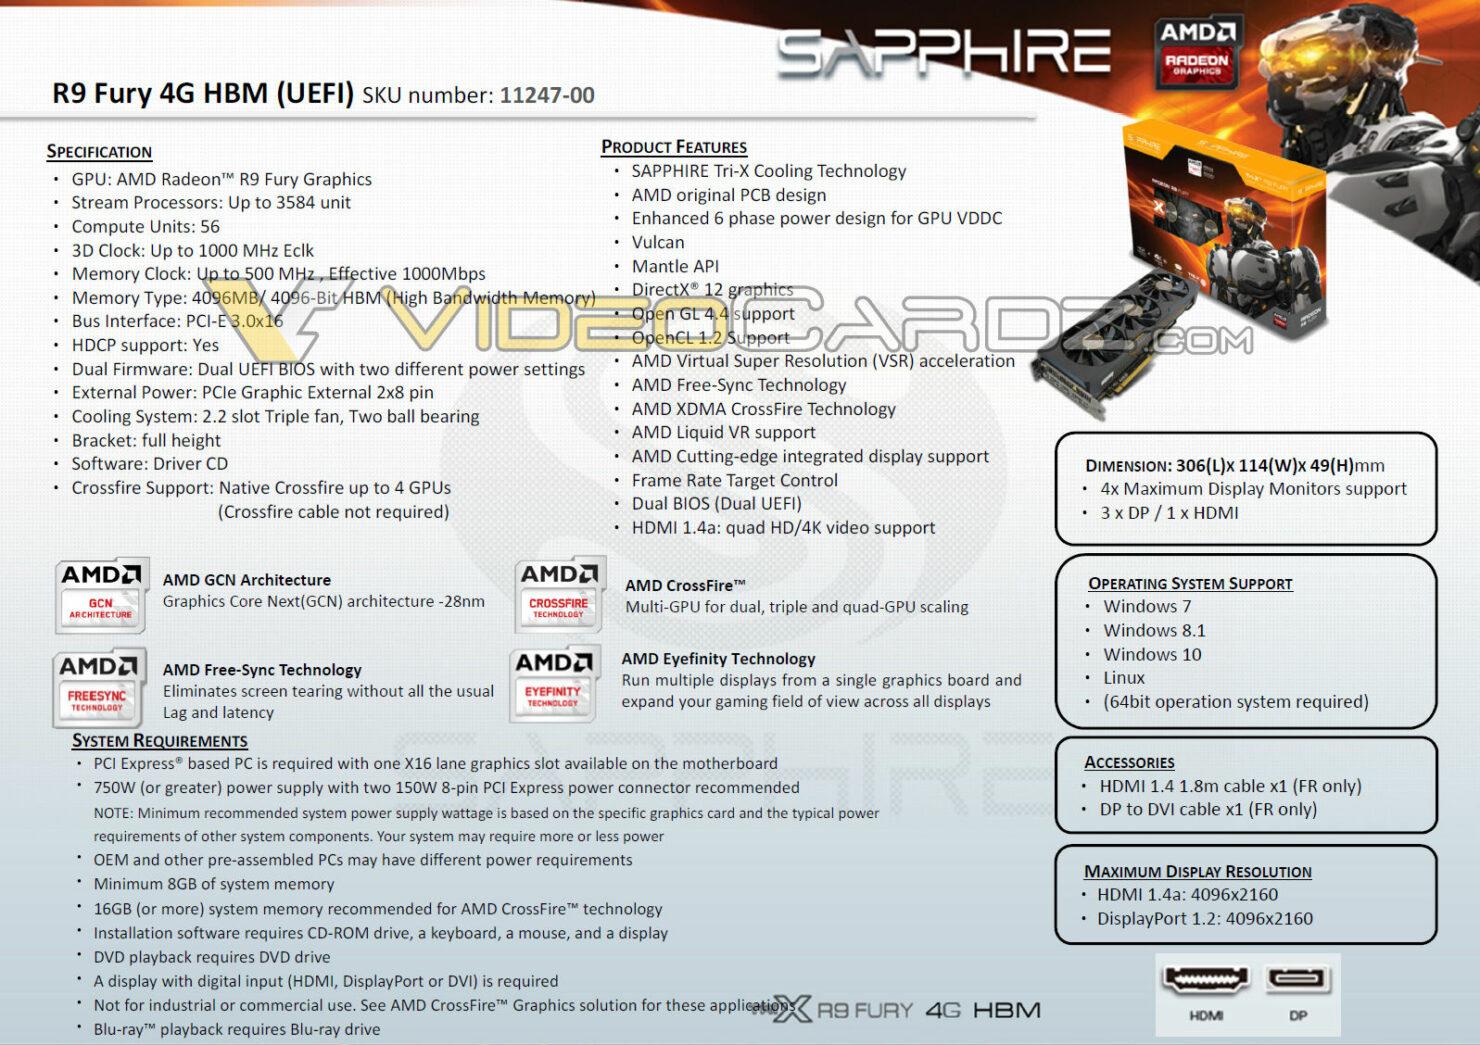 sapphire-radeon-r9-fury-tri-x-4-gb-hbm-graphics-card_specs